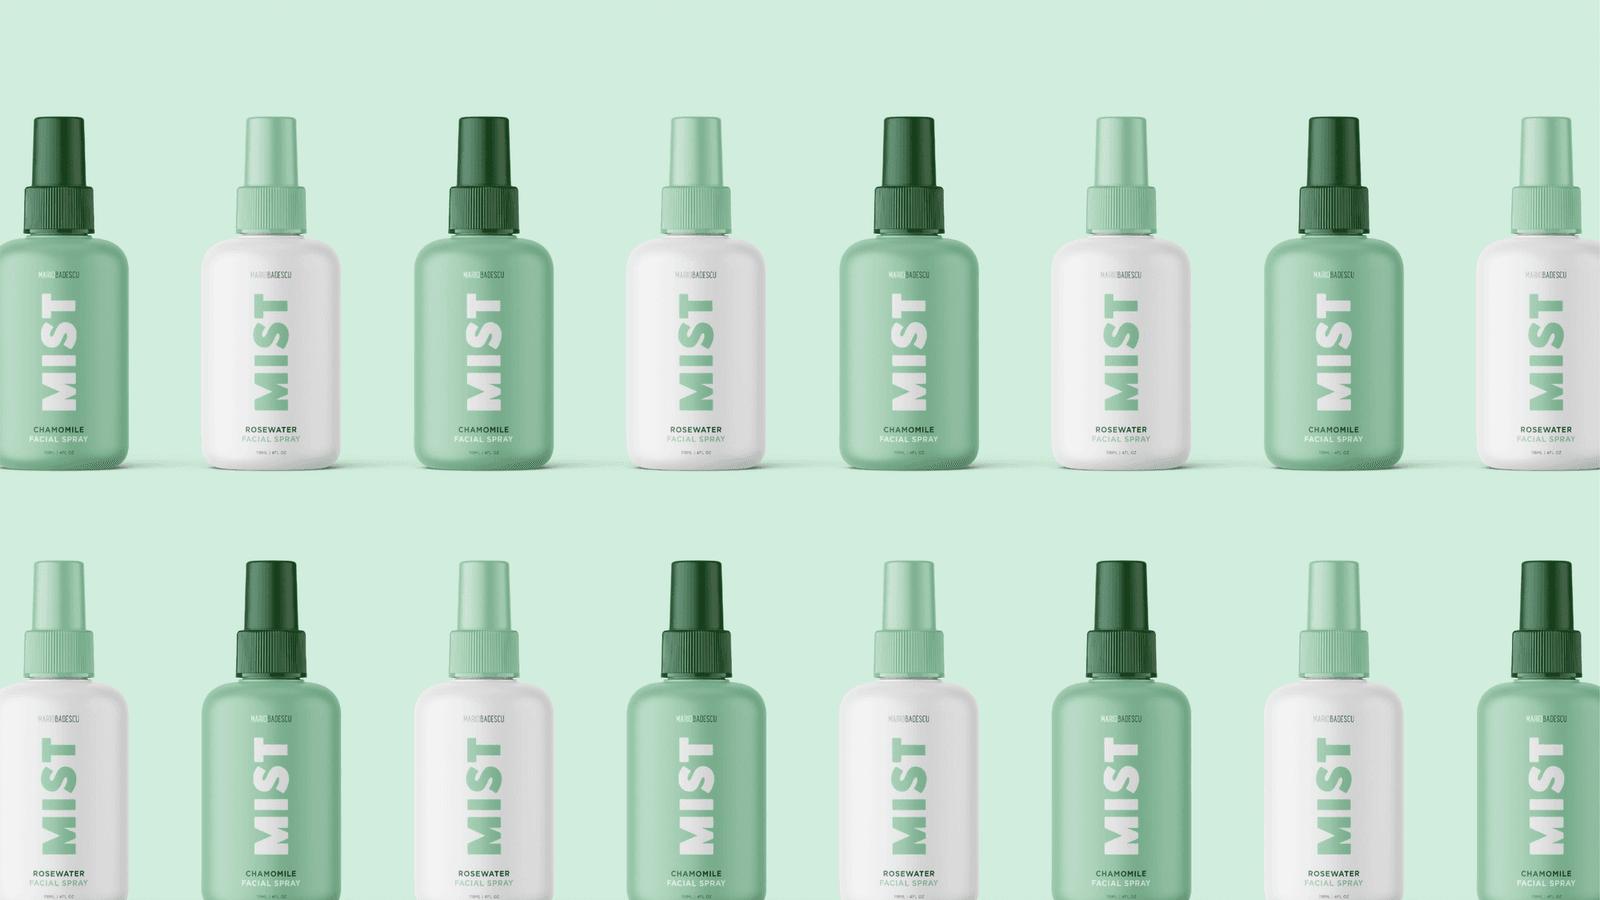 Mario Badescu Skincare // Packaging